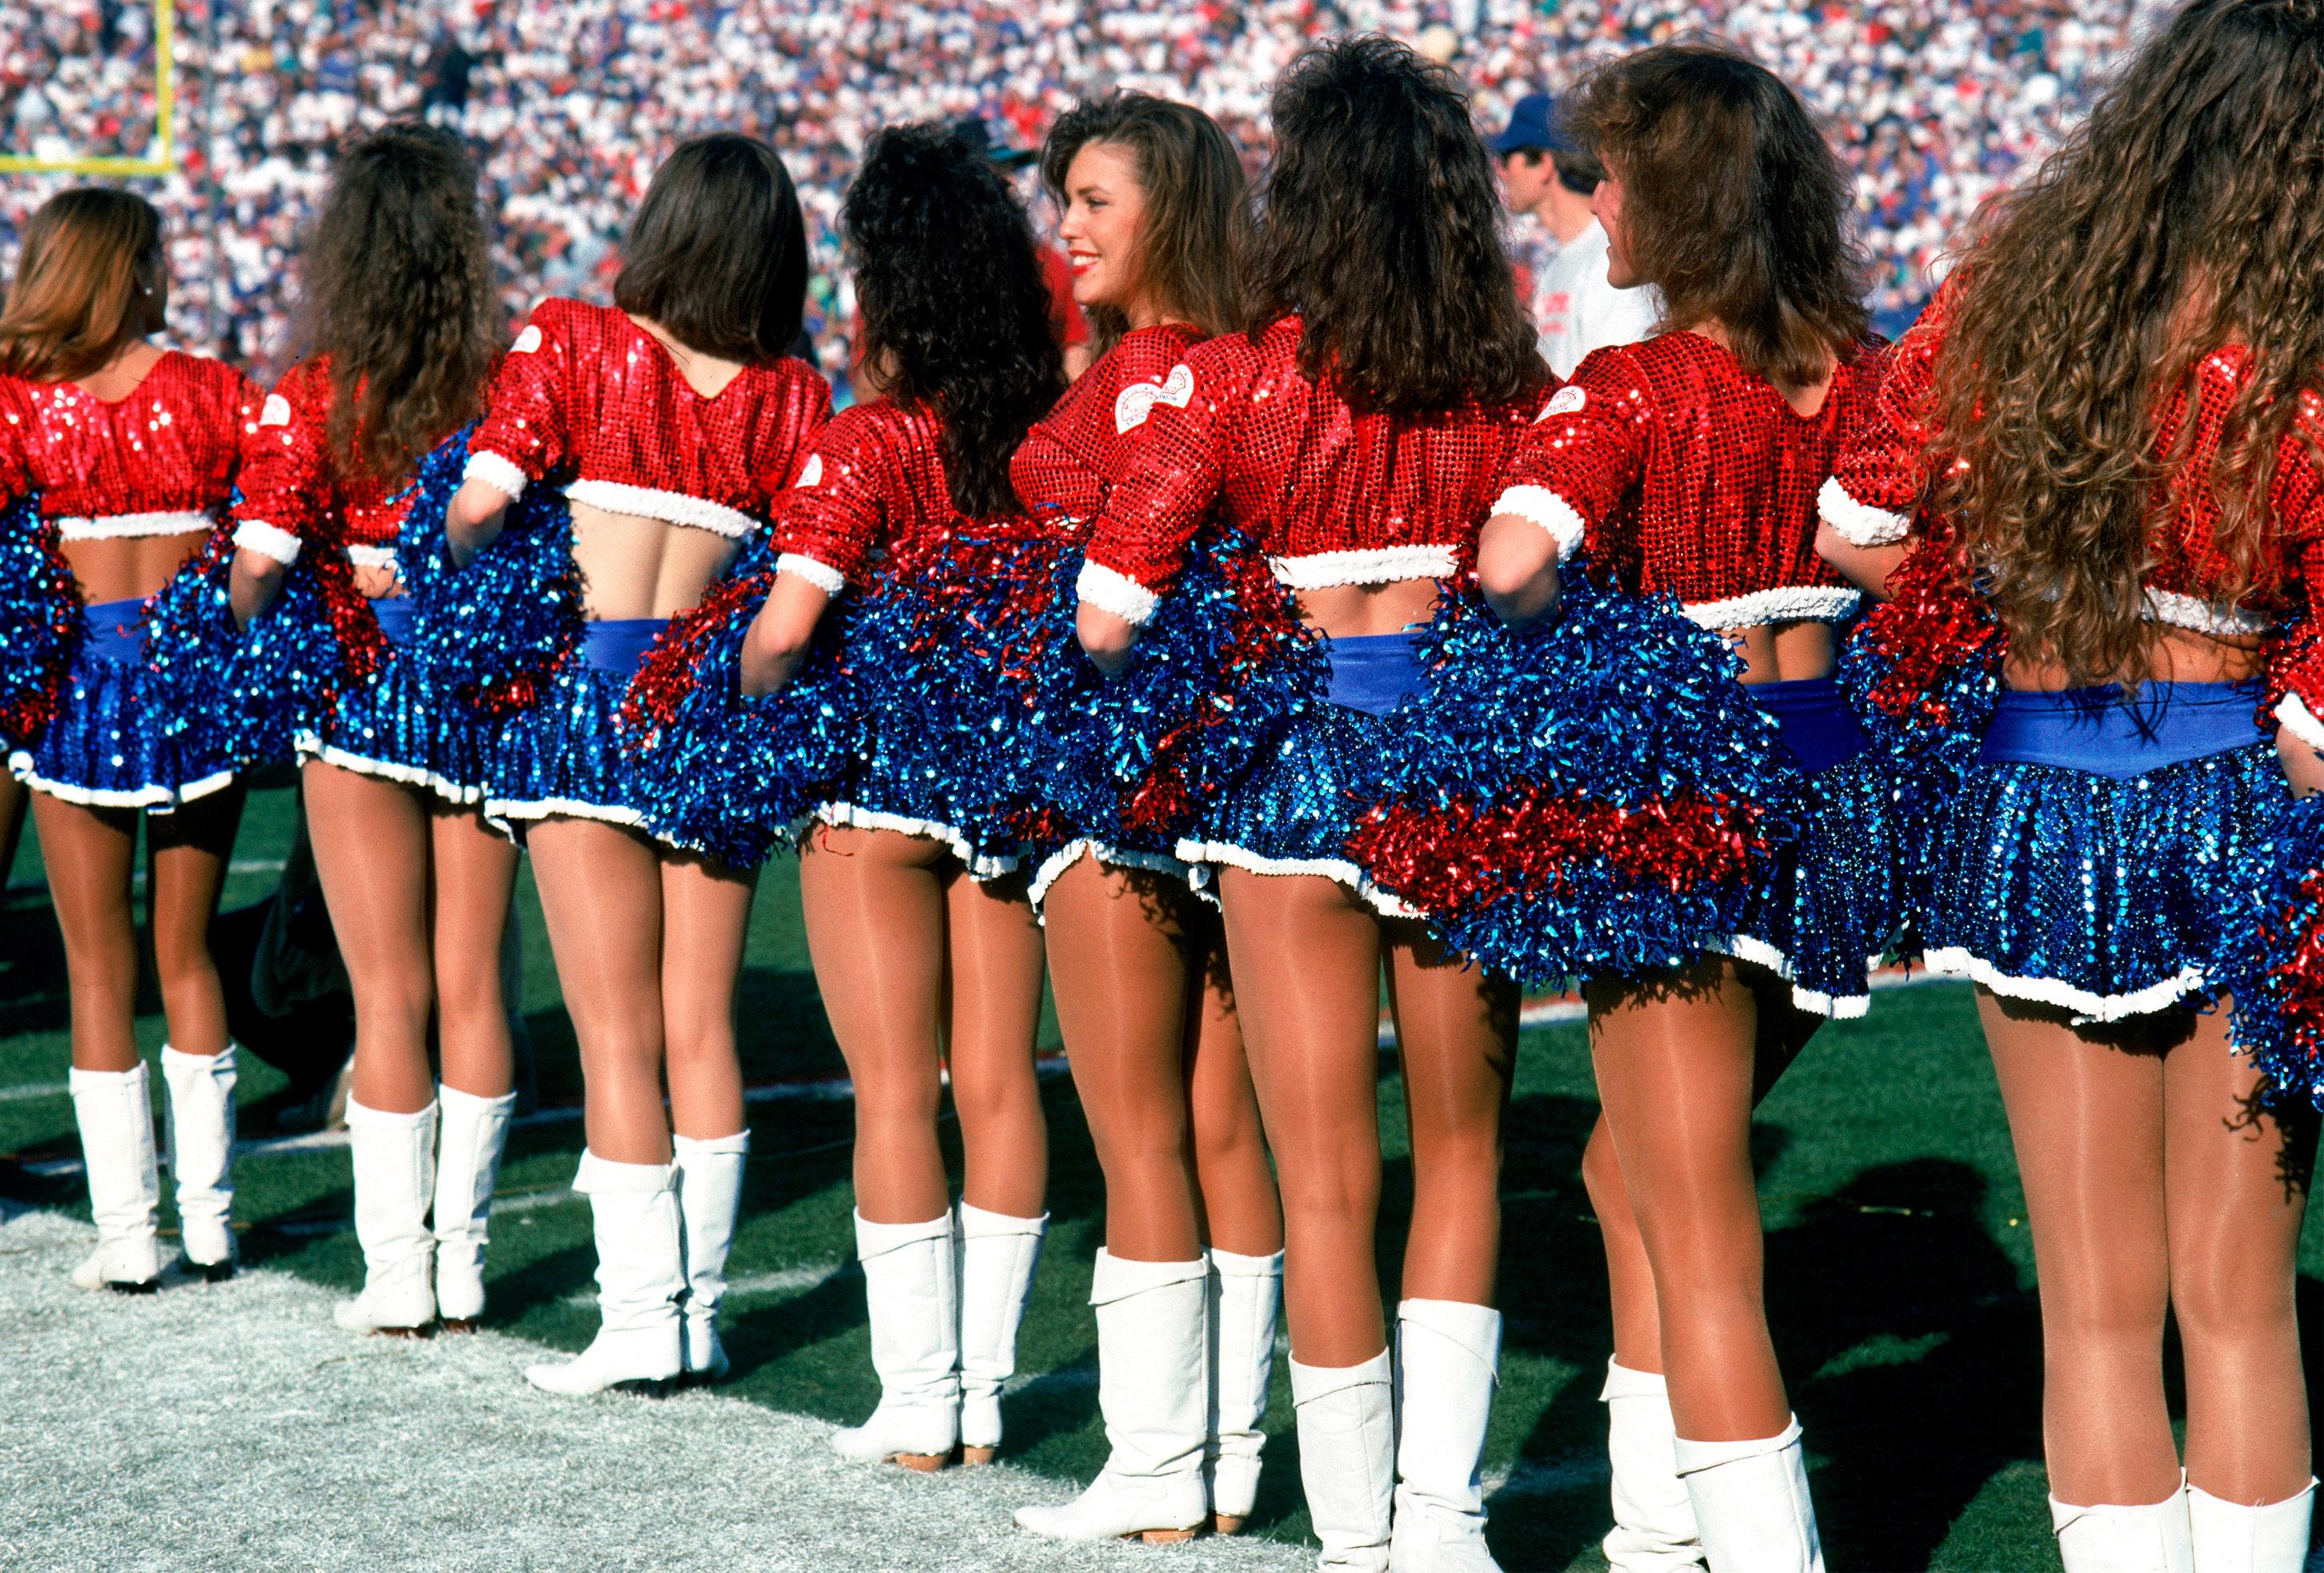 Cheerleaders first sex experience